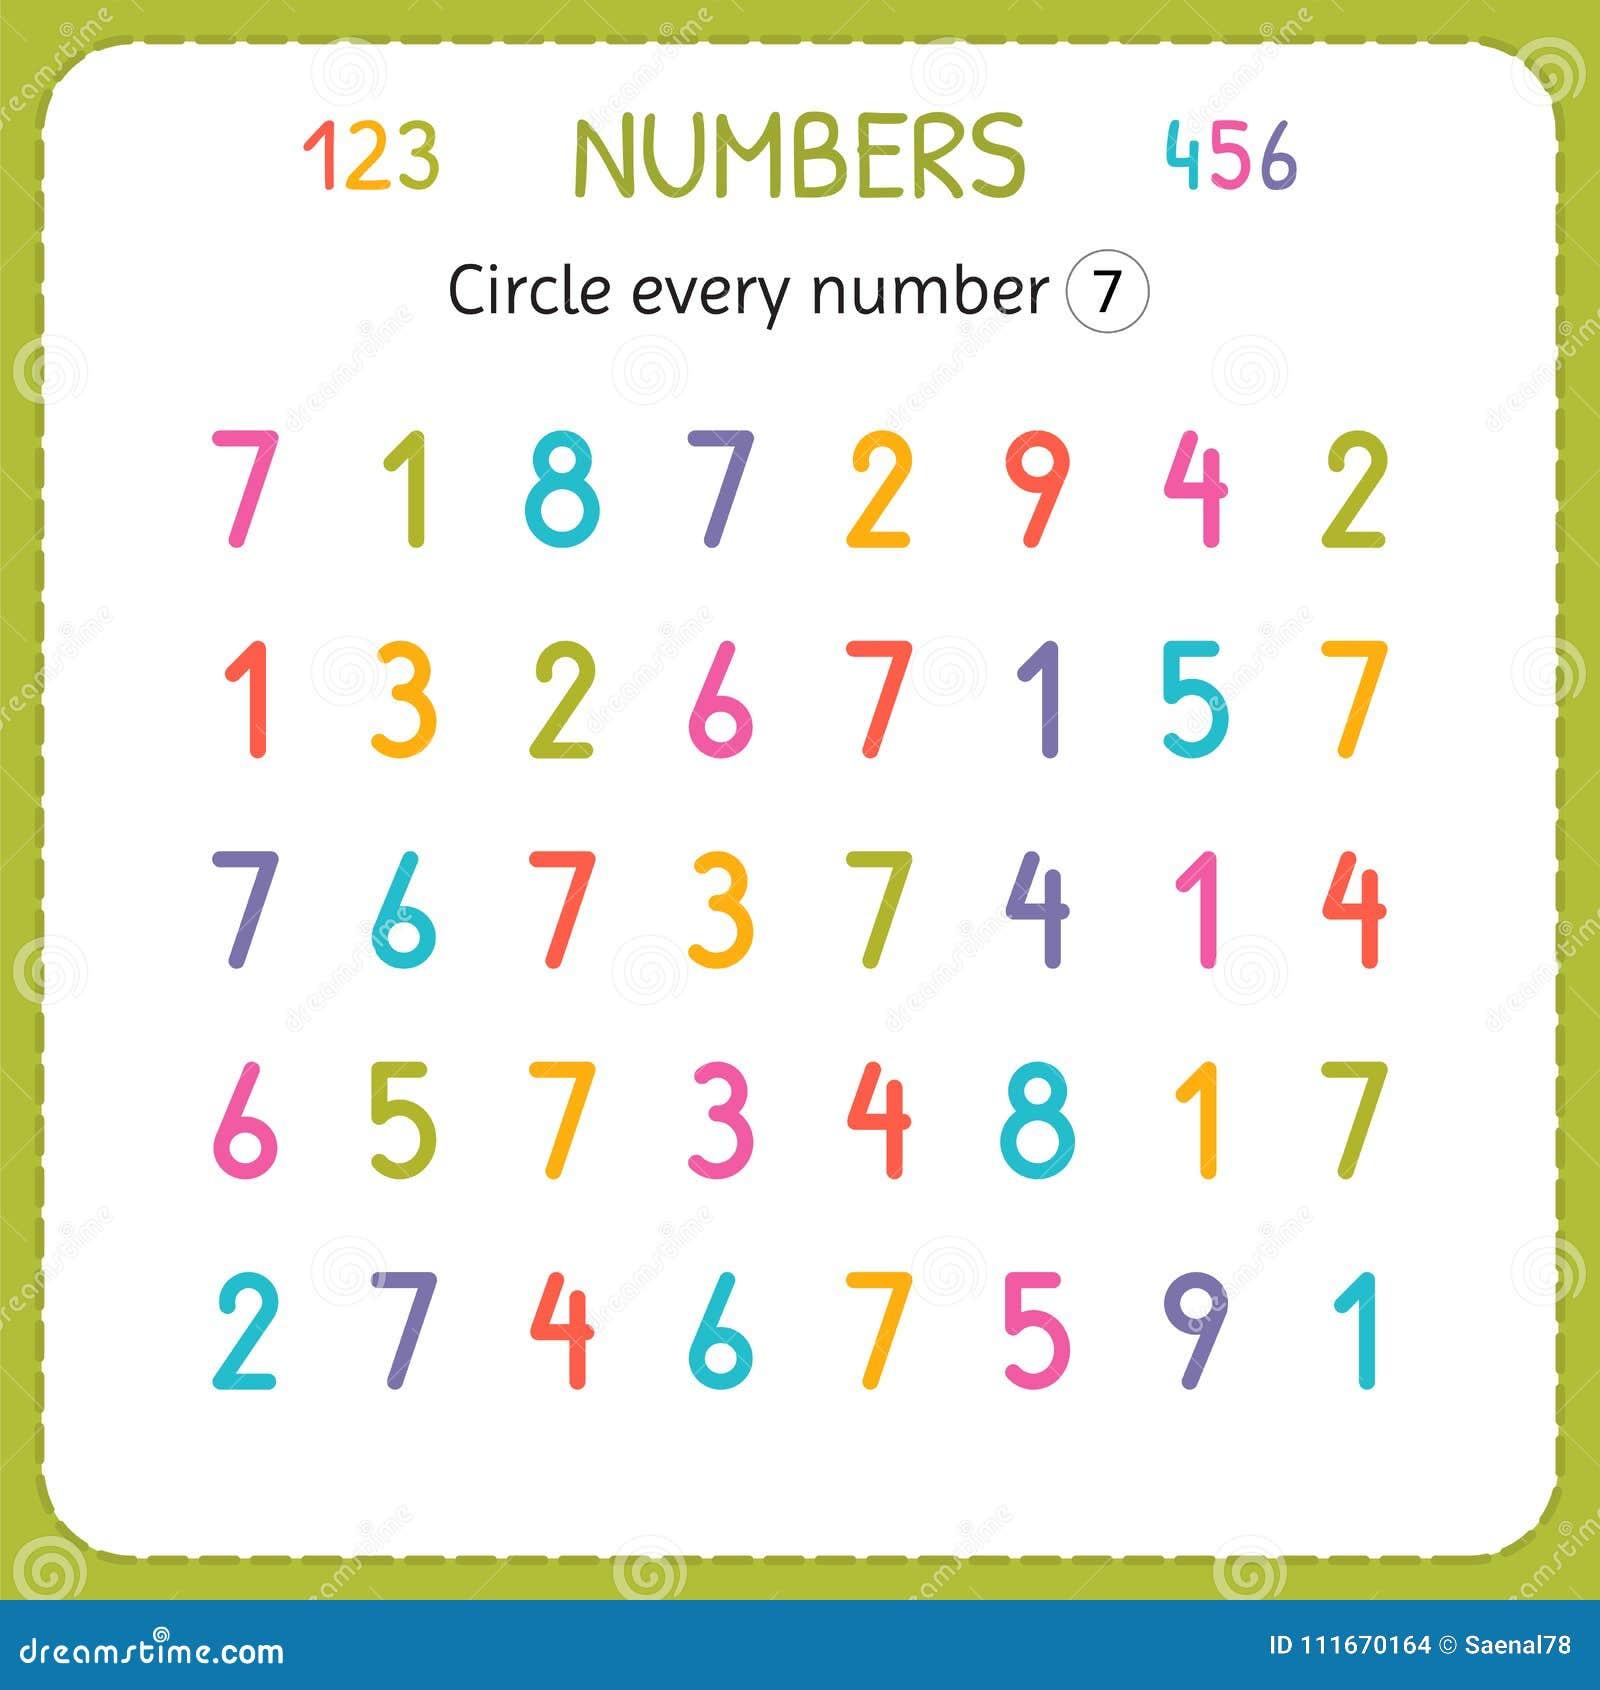 circle every number seven numbers for kids worksheet for kindergarten and preschool training. Black Bedroom Furniture Sets. Home Design Ideas